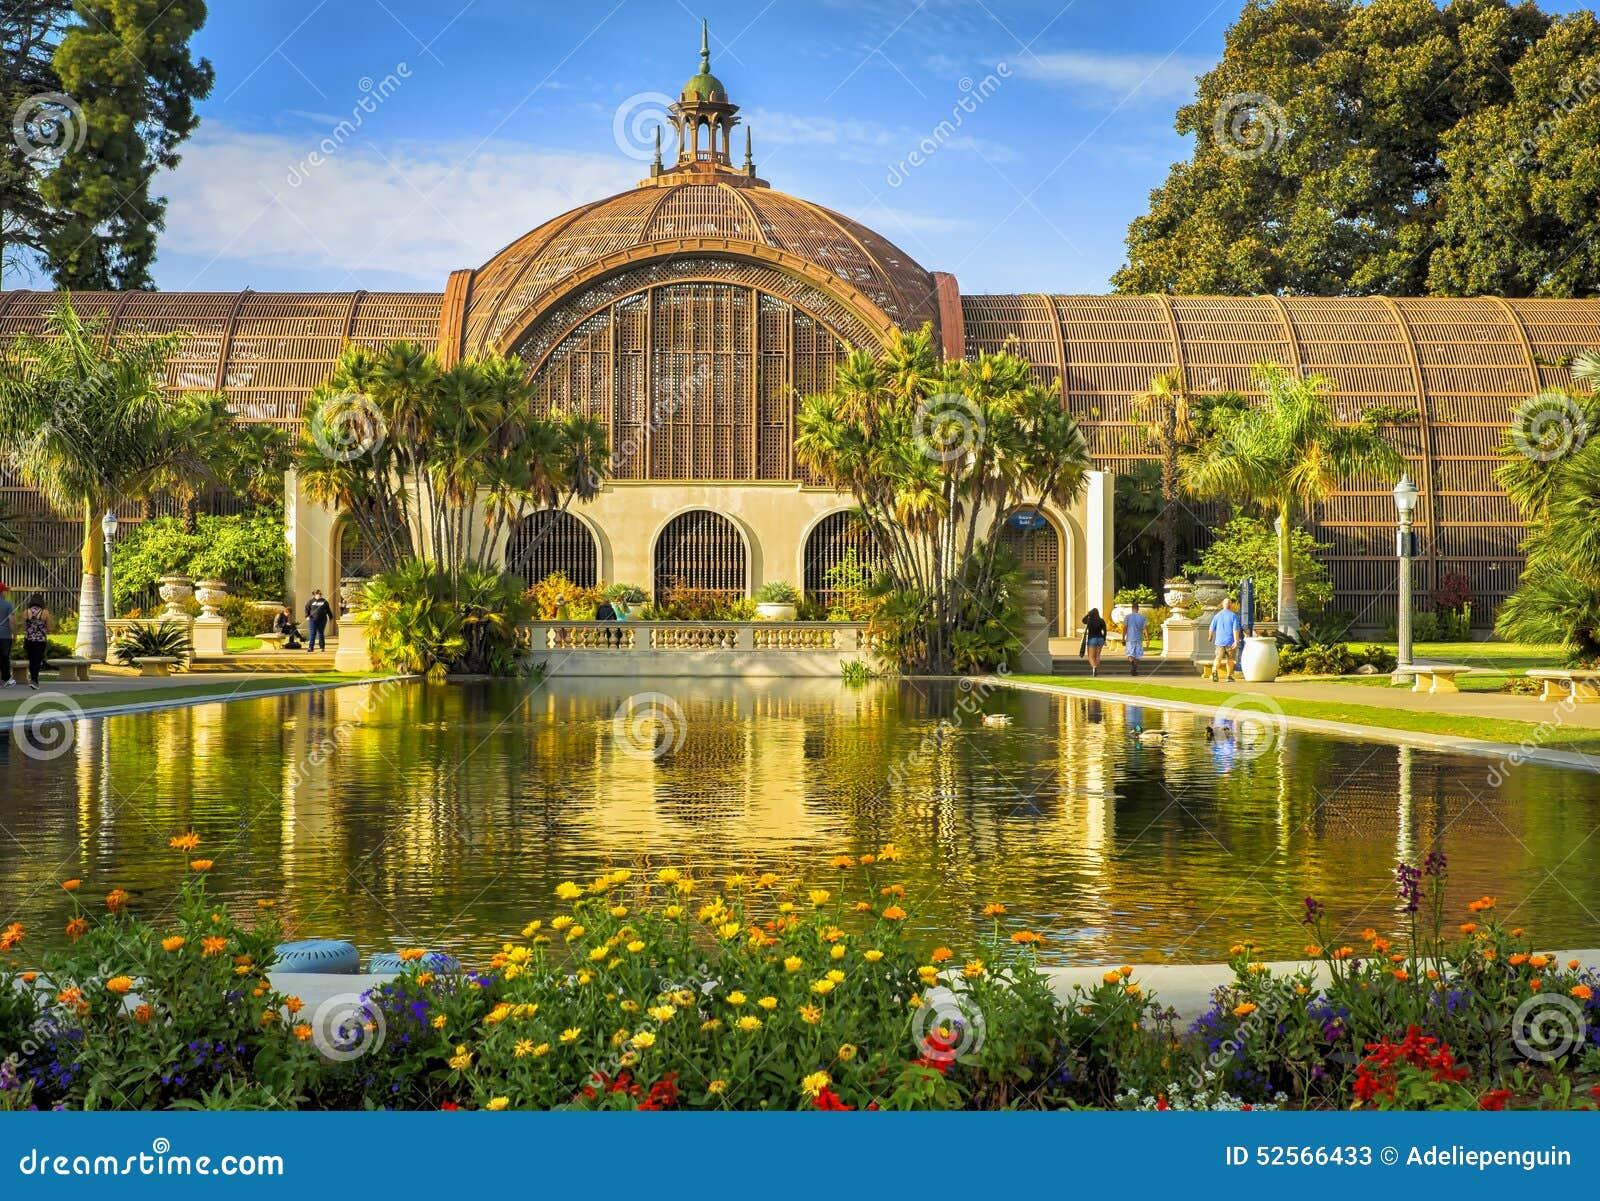 Balboa Park, San Diego, Botanical Building